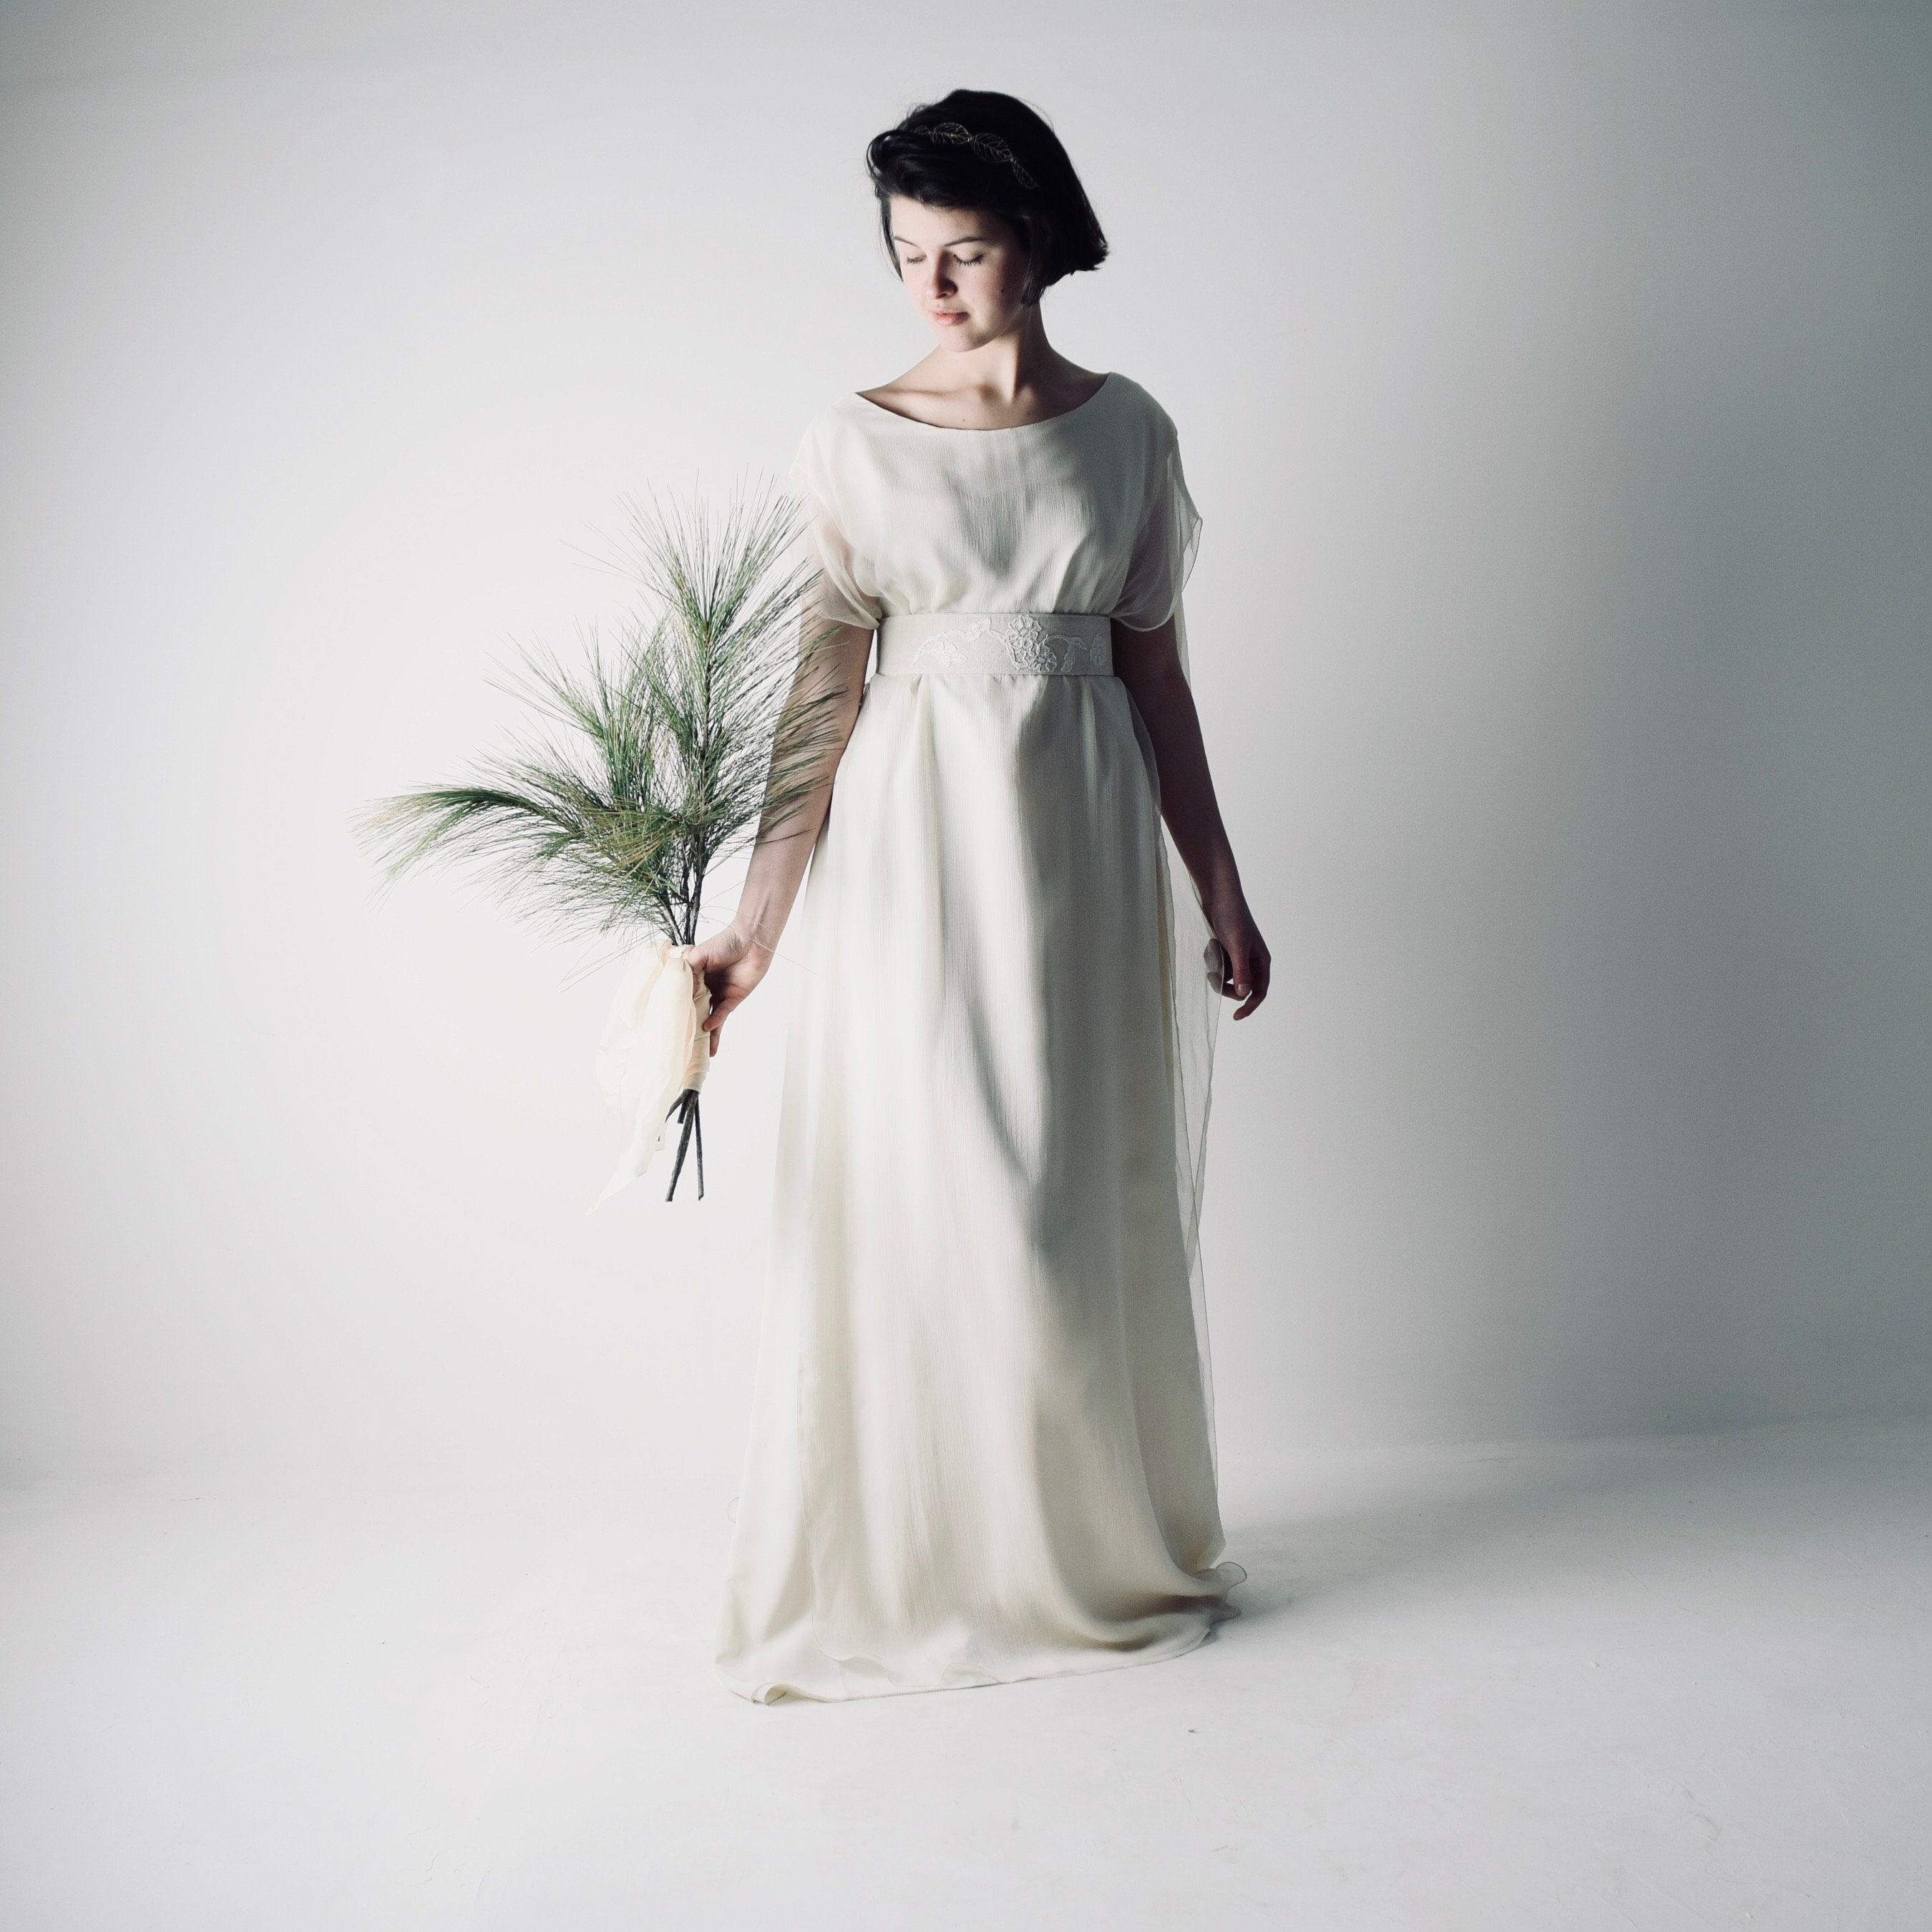 Pagan Wedding Dresses.Boho Wedding Dress Bohemian Wedding Dress Pagan Wedding Dress Casual Wedding Dress Alternative Wedding Simple Wedding Dress Hedera